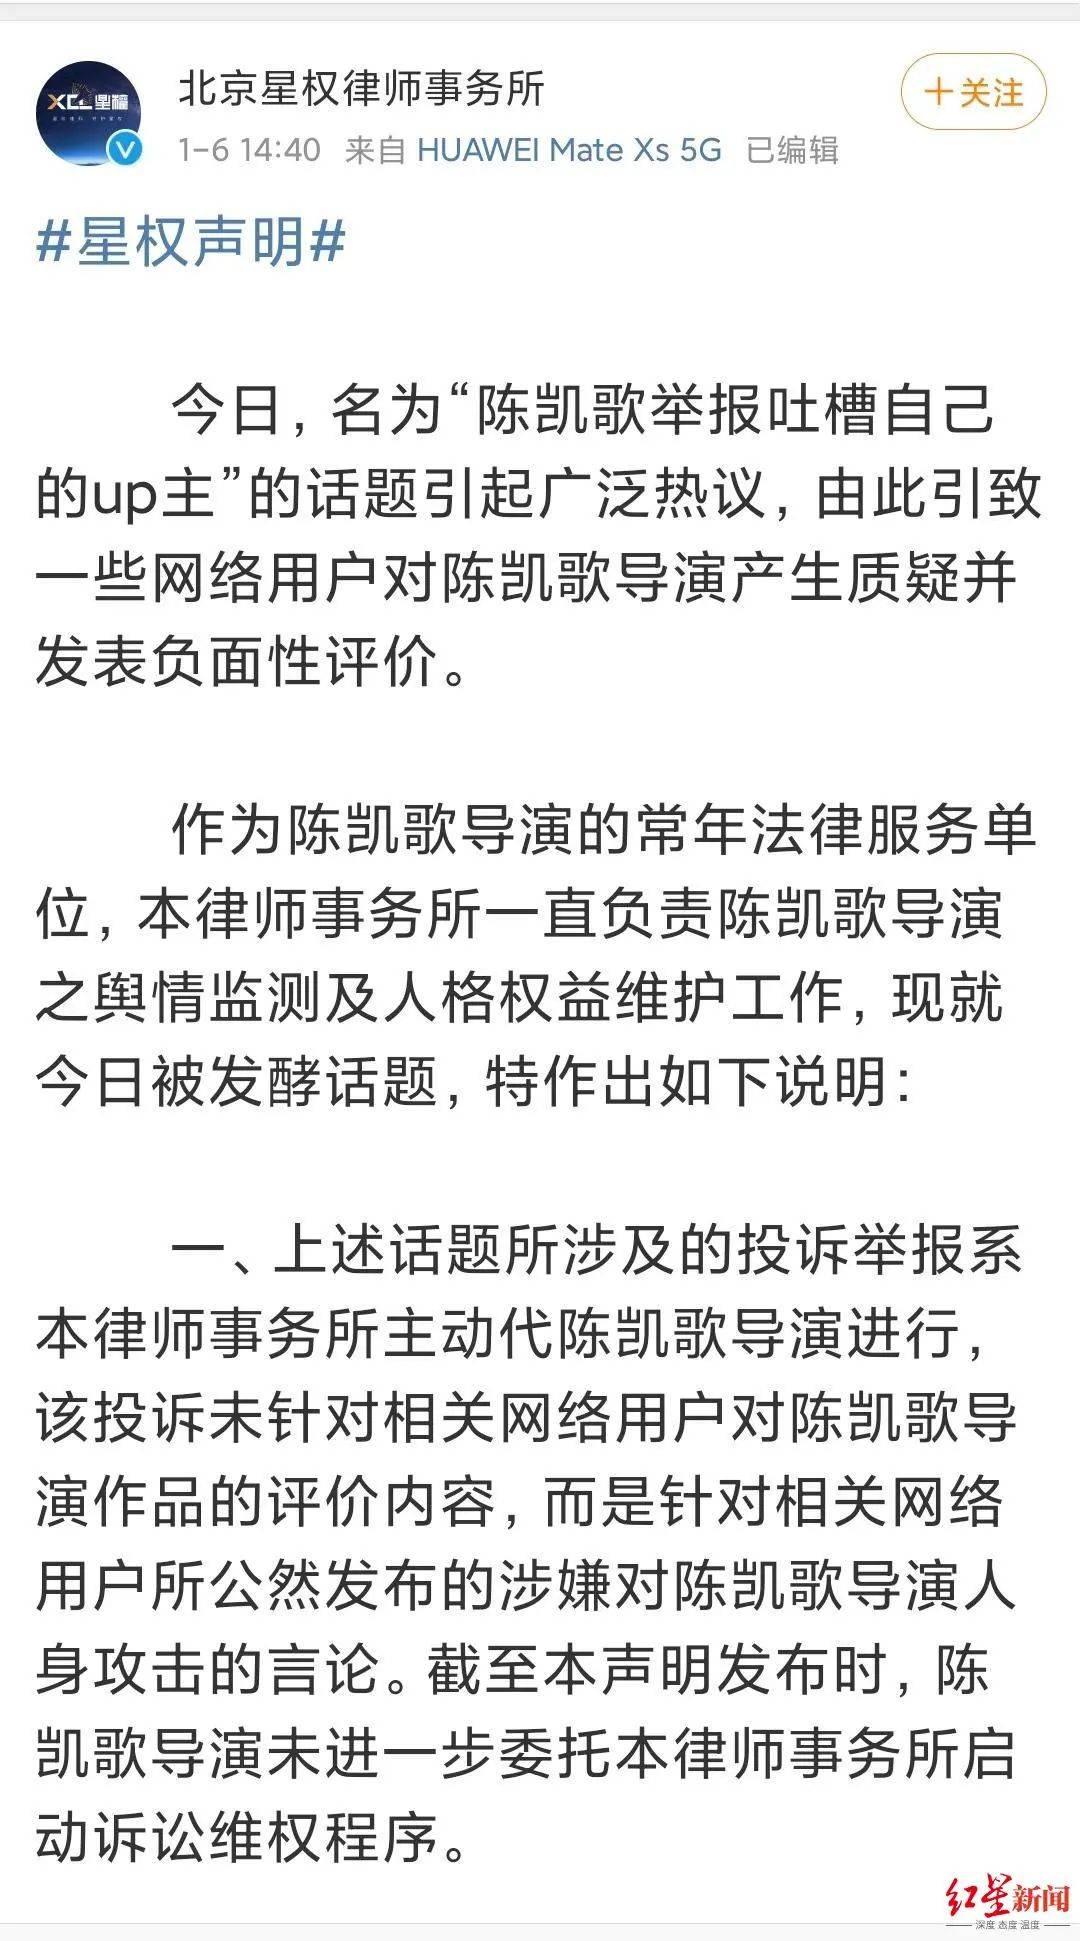 B站up主吐槽陈凯歌被举报,律师团队称对人身攻击零容忍